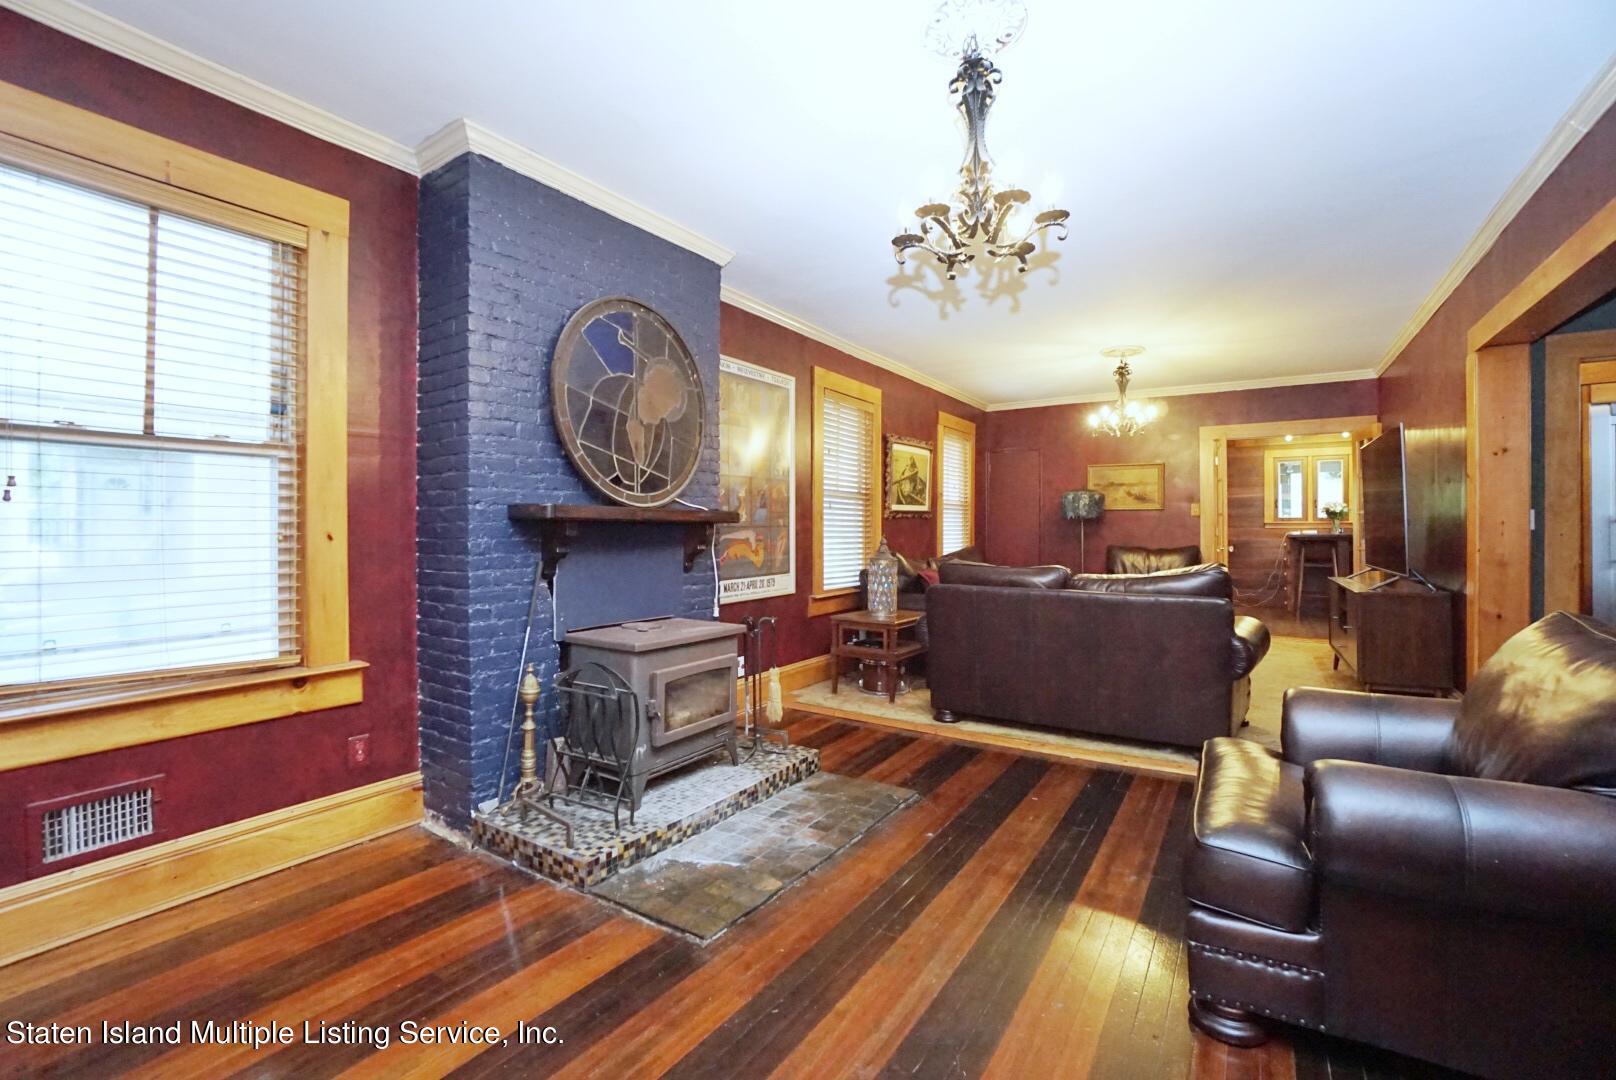 Single Family - Detached 136 York Avenue  Staten Island, NY 10301, MLS-1147575-8